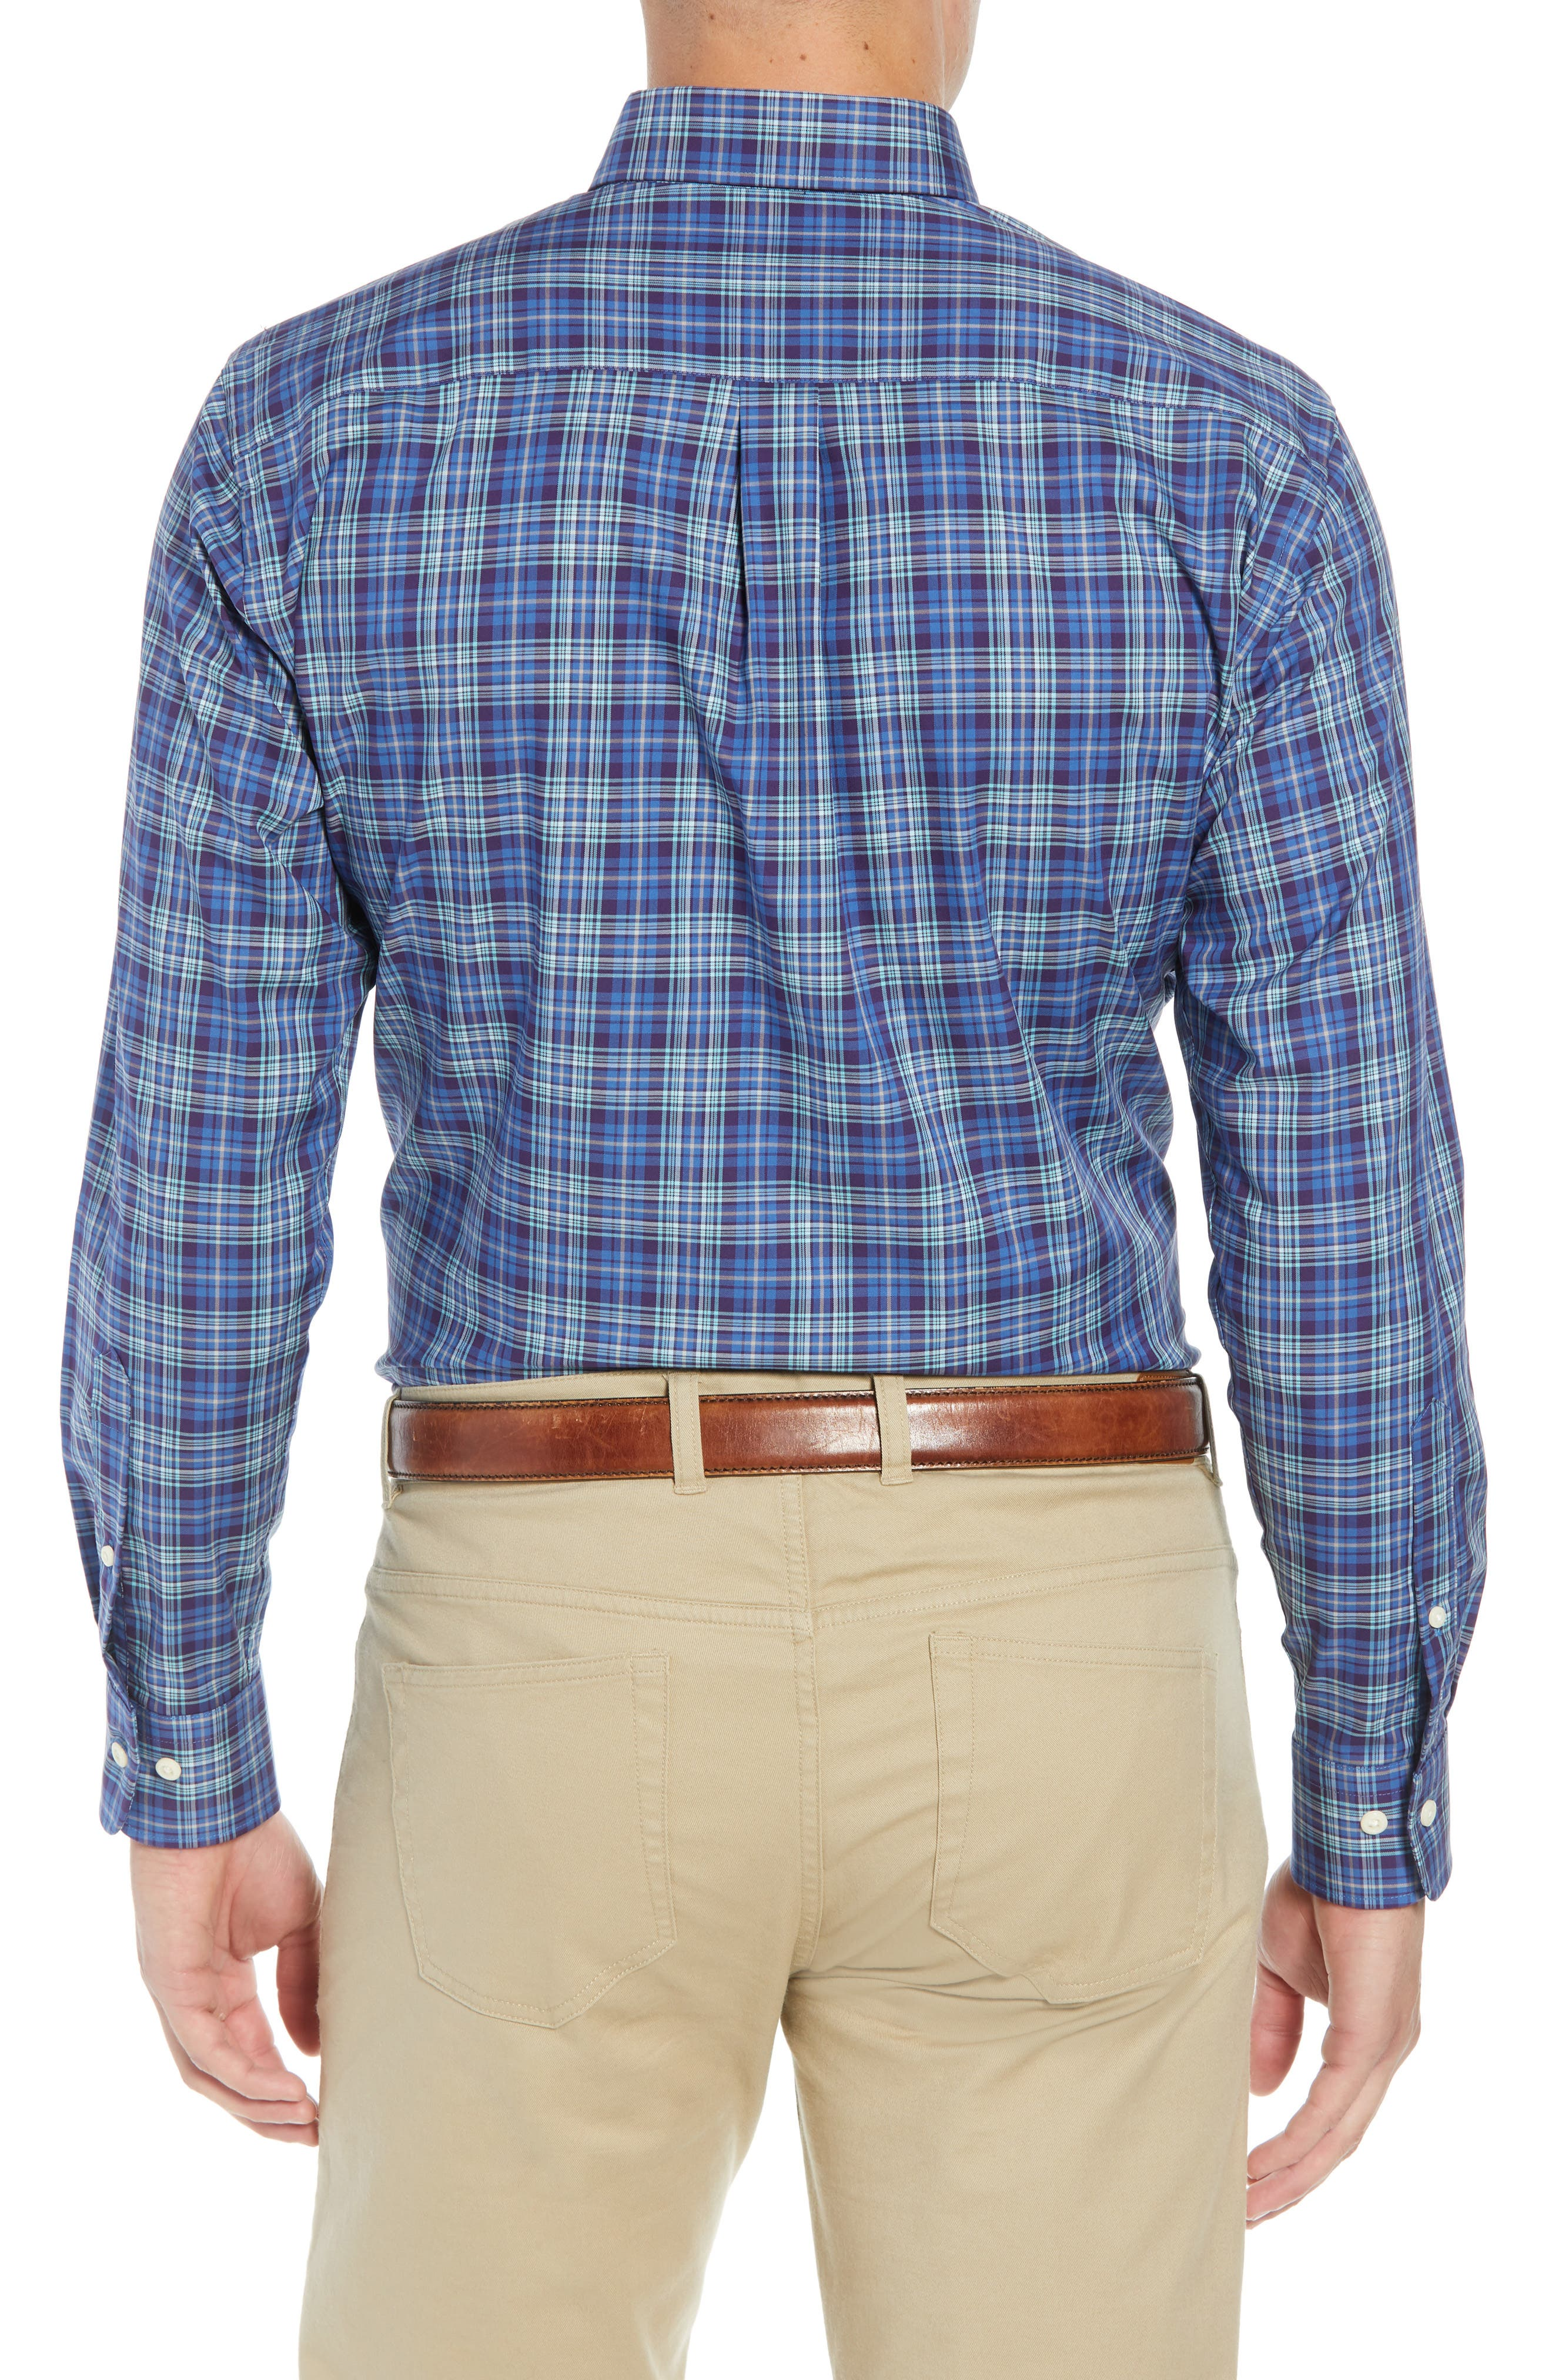 Crown Ease Flatey Island Regular Fit Tartan Plaid Sport Shirt,                             Alternate thumbnail 3, color,                             BLUE